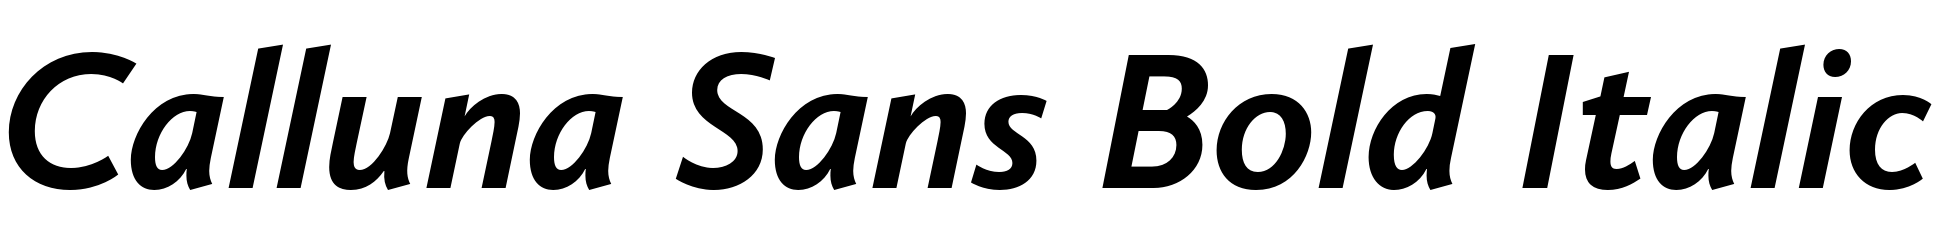 Calluna Sans Bold Italic